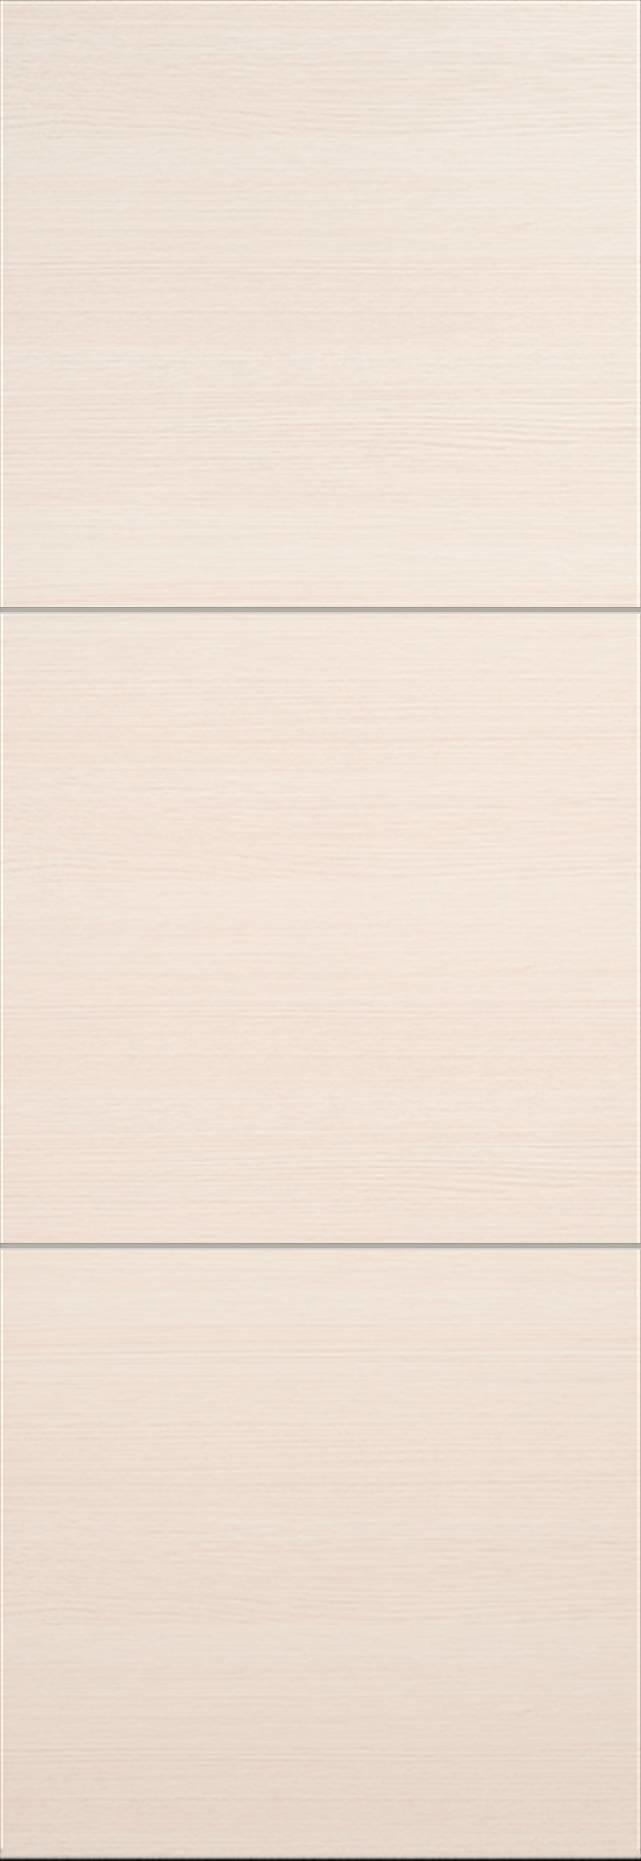 Tivoli В-2 Invisible цвет - Беленый дуб Без стекла (ДГ)